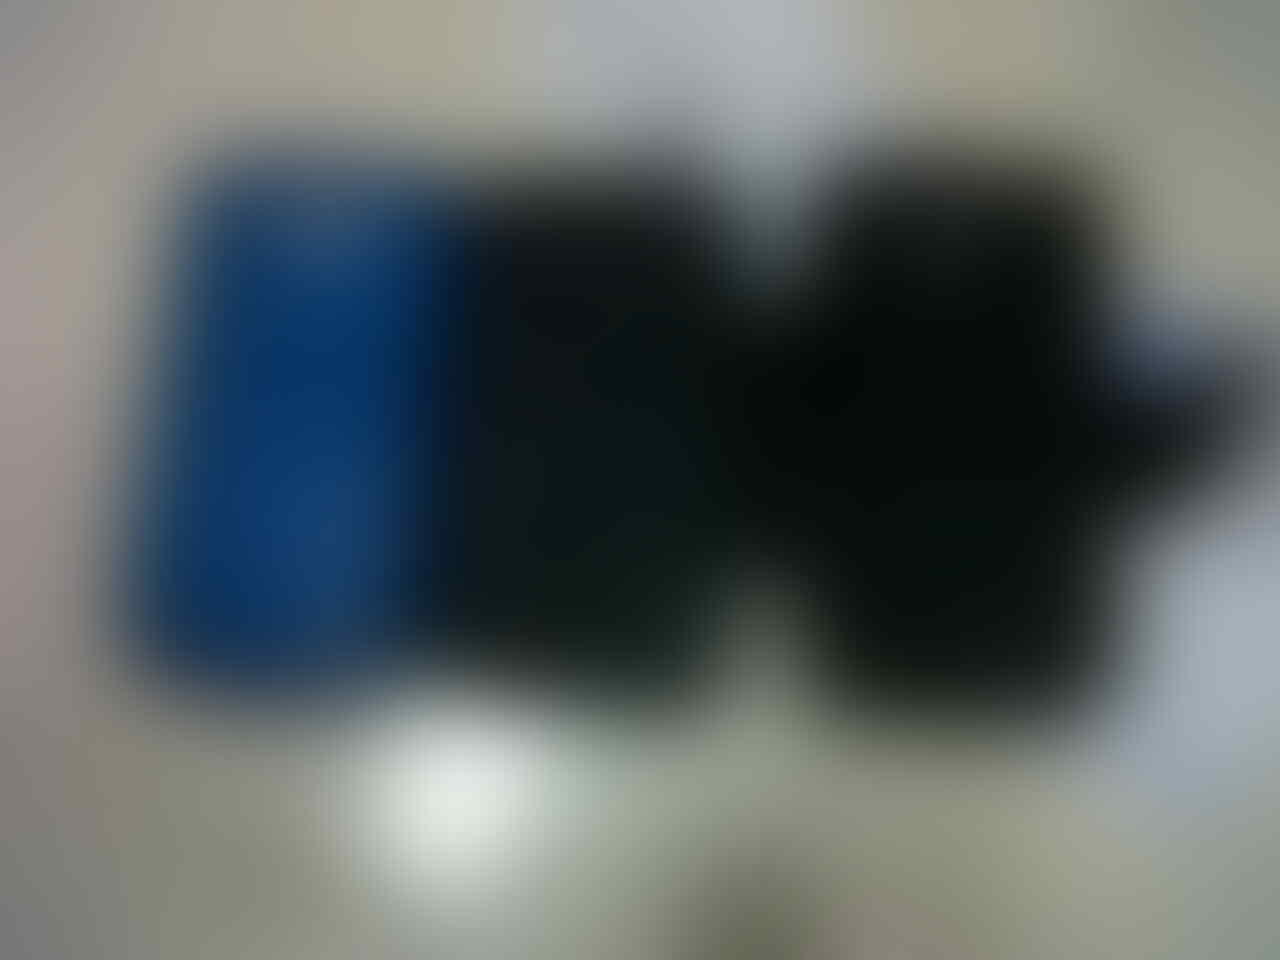 GALAXY WONDER BLACK COMPLETE, MURMER, BARU 2 BULAN, MULUS 99%